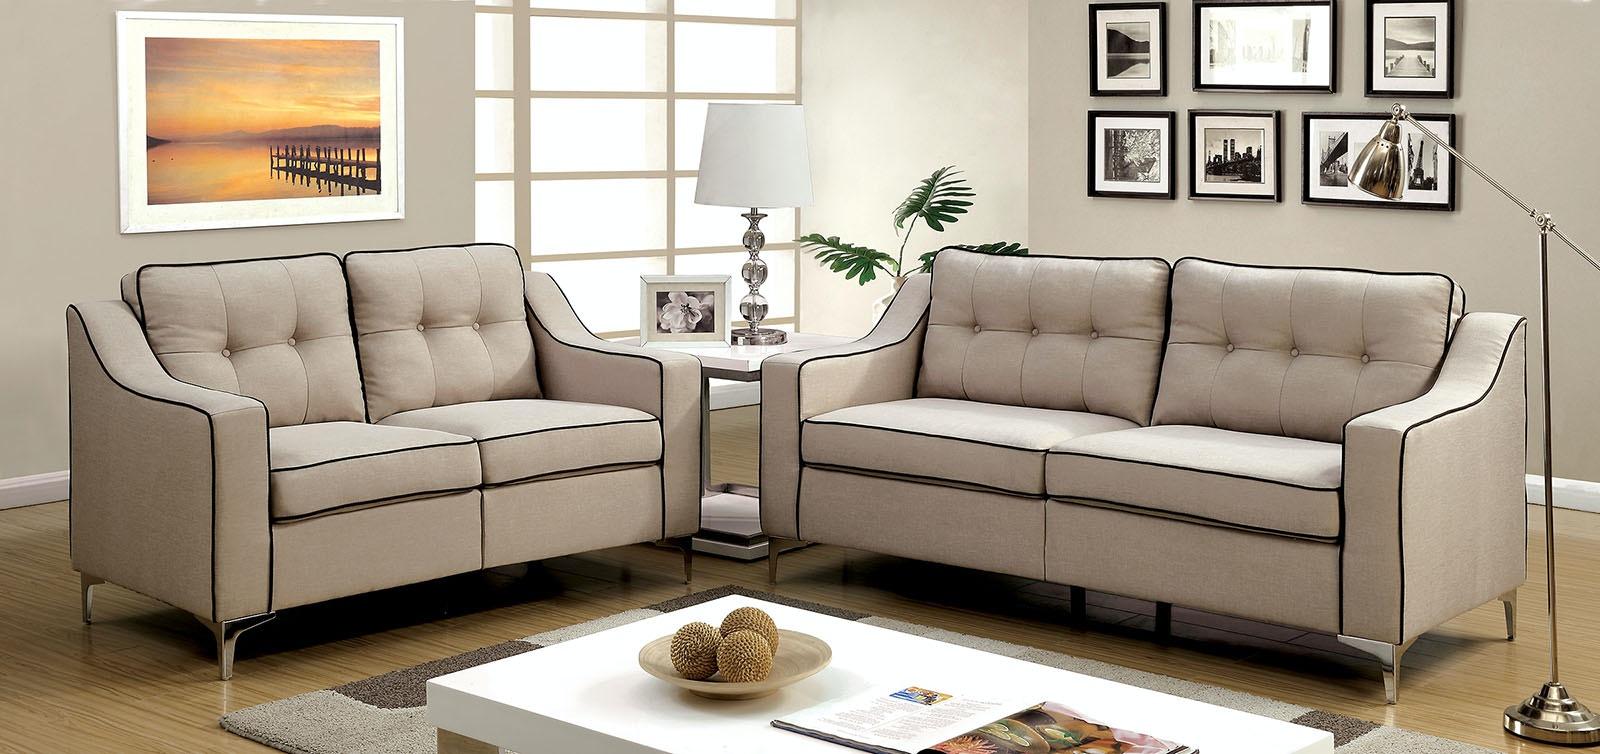 Furniture Of America Sofa + Love Seat CM6850BG 2PC